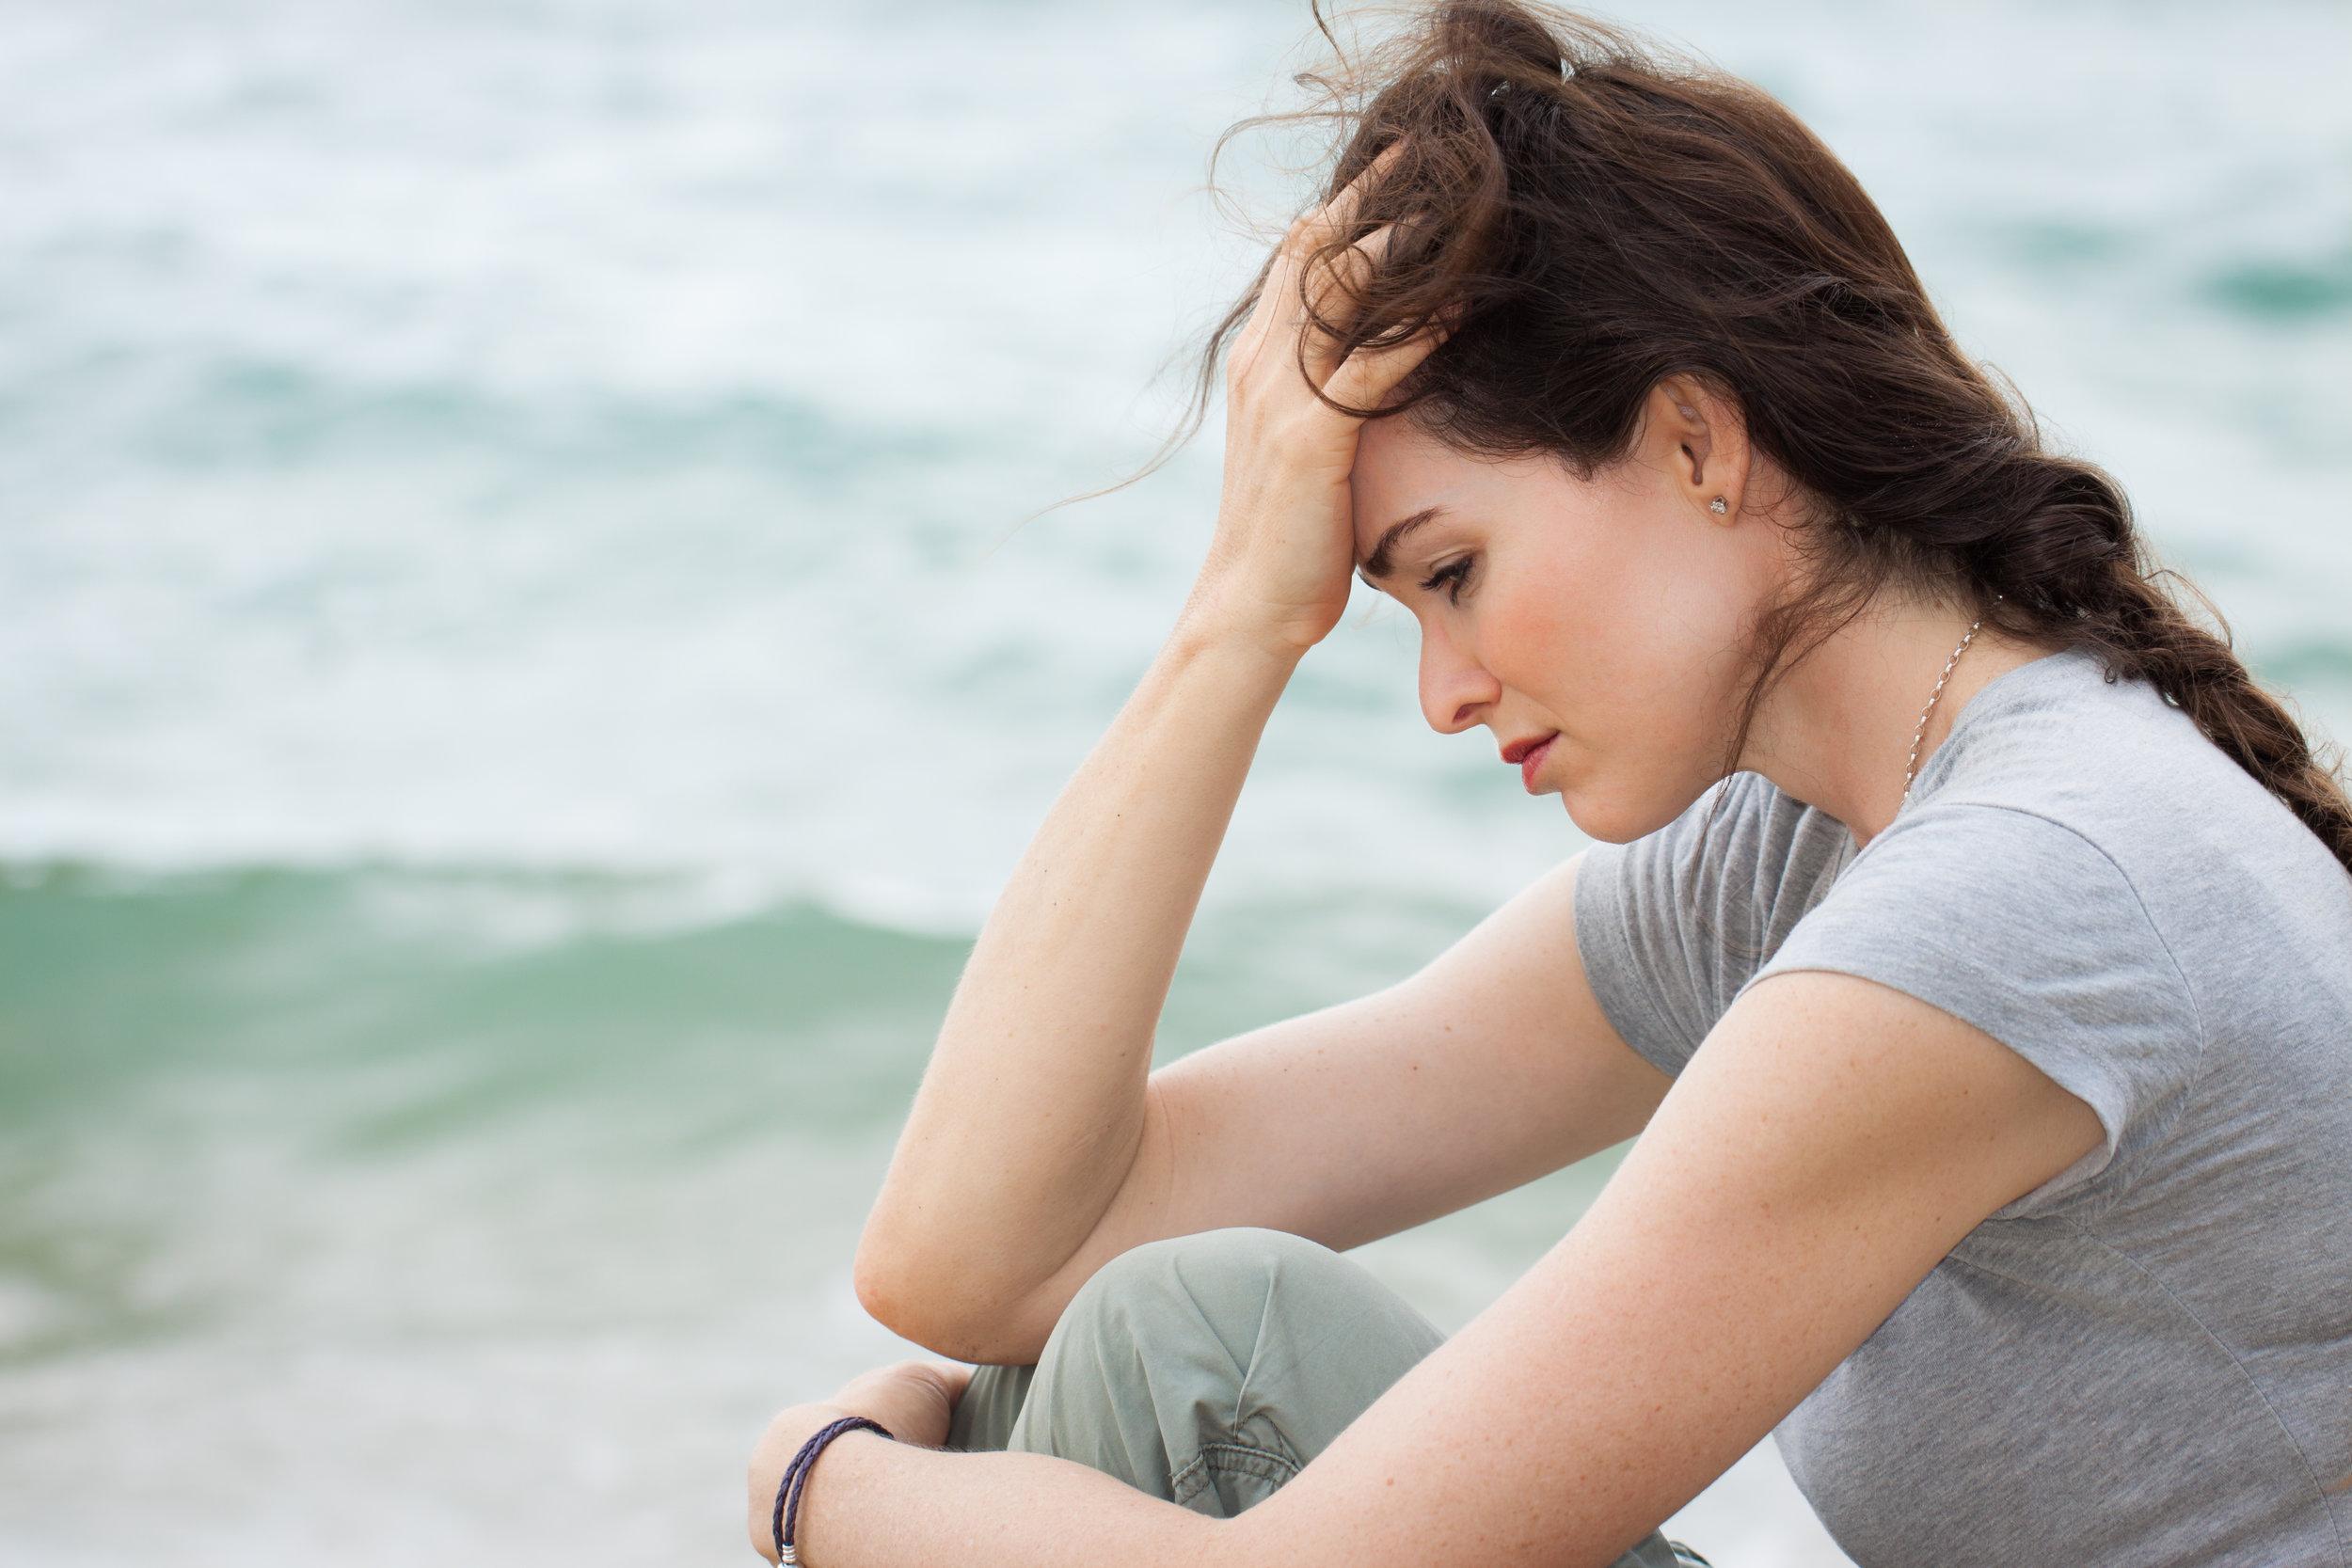 bigstock-sad-and-upset-woman-deep-in-th-42814339.jpg